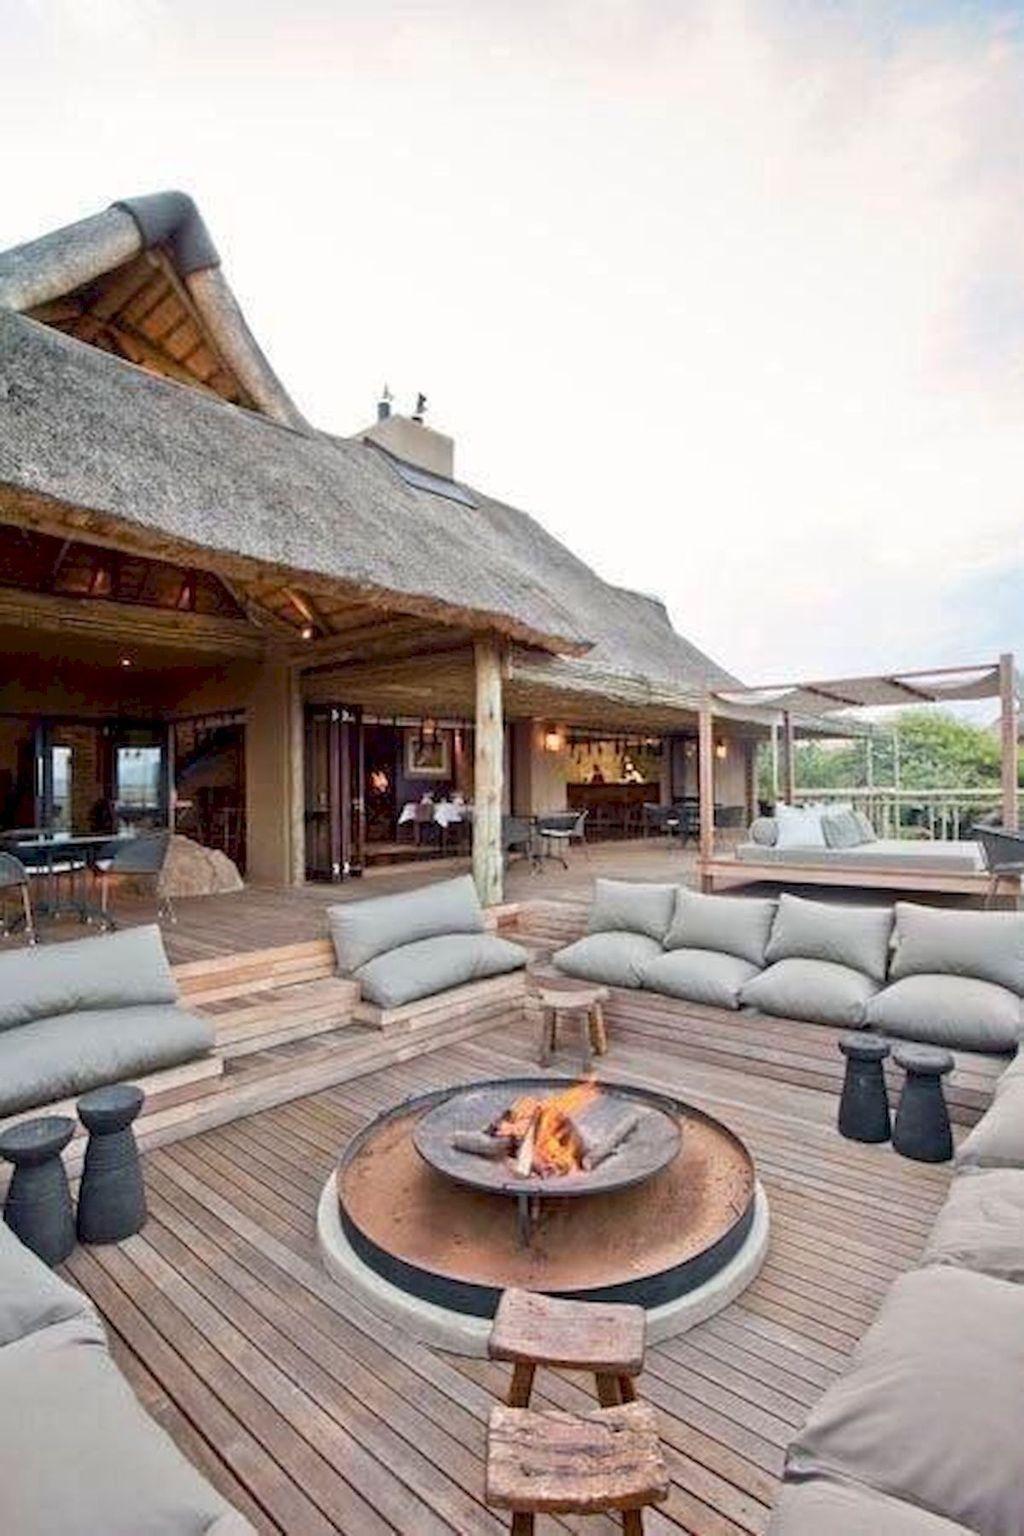 34 Superb Terrace Design Ideas For You - OMGHOMEDECOR #terracedesign